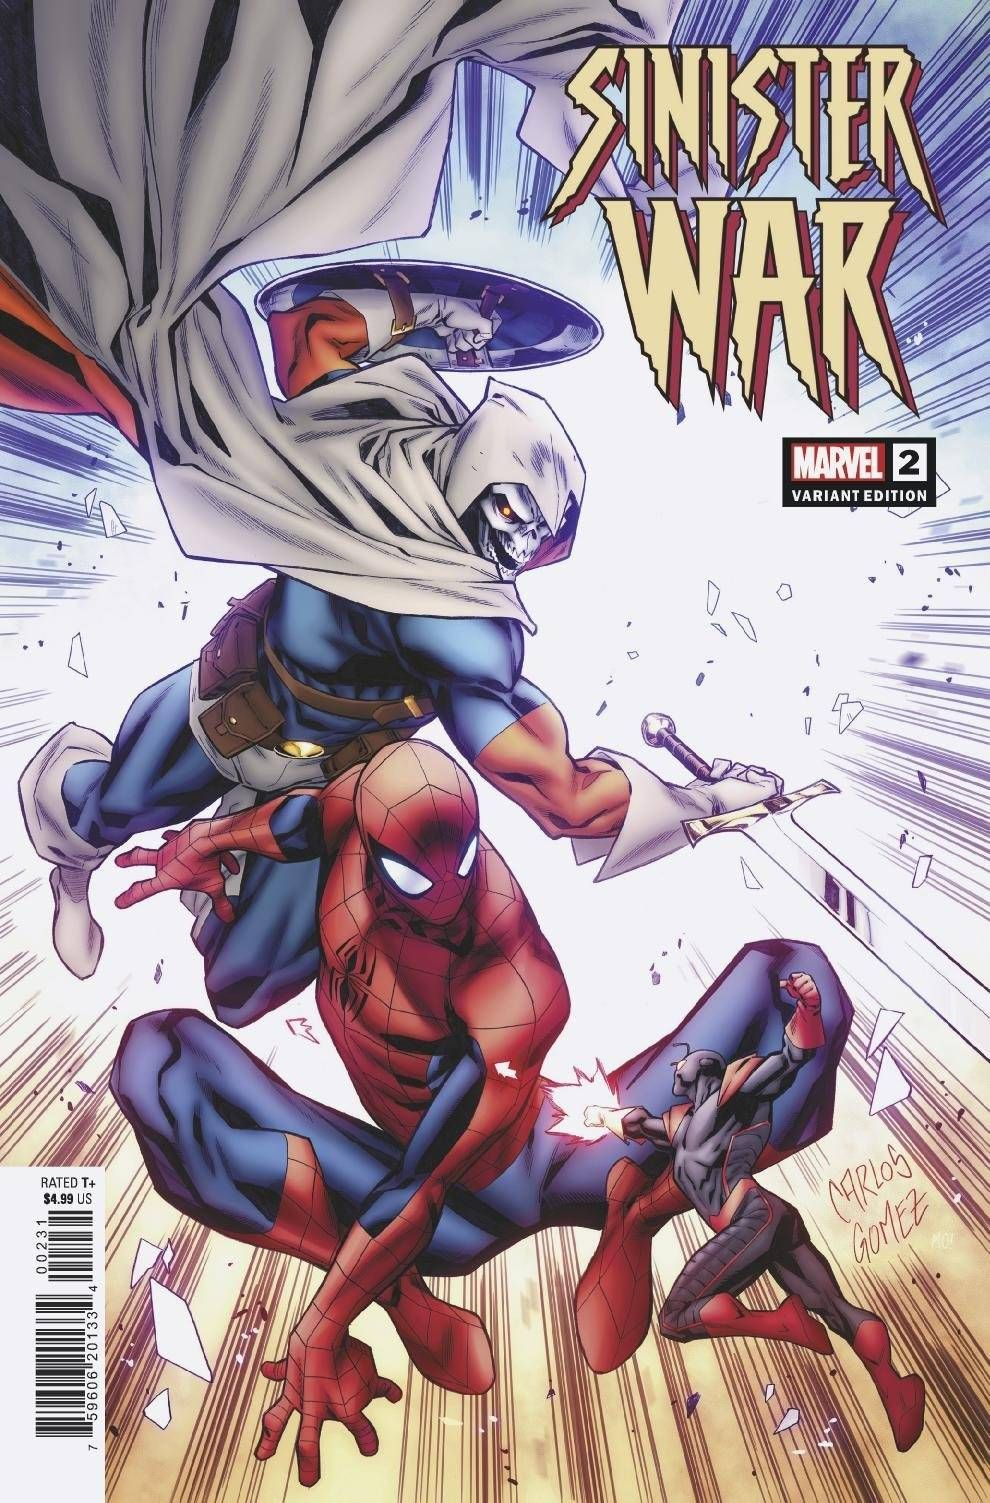 eyJidWNrZXQiOiJnb2NvbGxlY3QuaW1hZ2VzLnB1YiIsImtleSI6IjMzYmEzZTc5LWMyMGQtNDRjYy1iNWQzLTc4MGZkNTcwNDkwNC5qcGciLCJlZGl0cyI6W119 ComicList: Marvel Comics New Releases for 08/04/2021